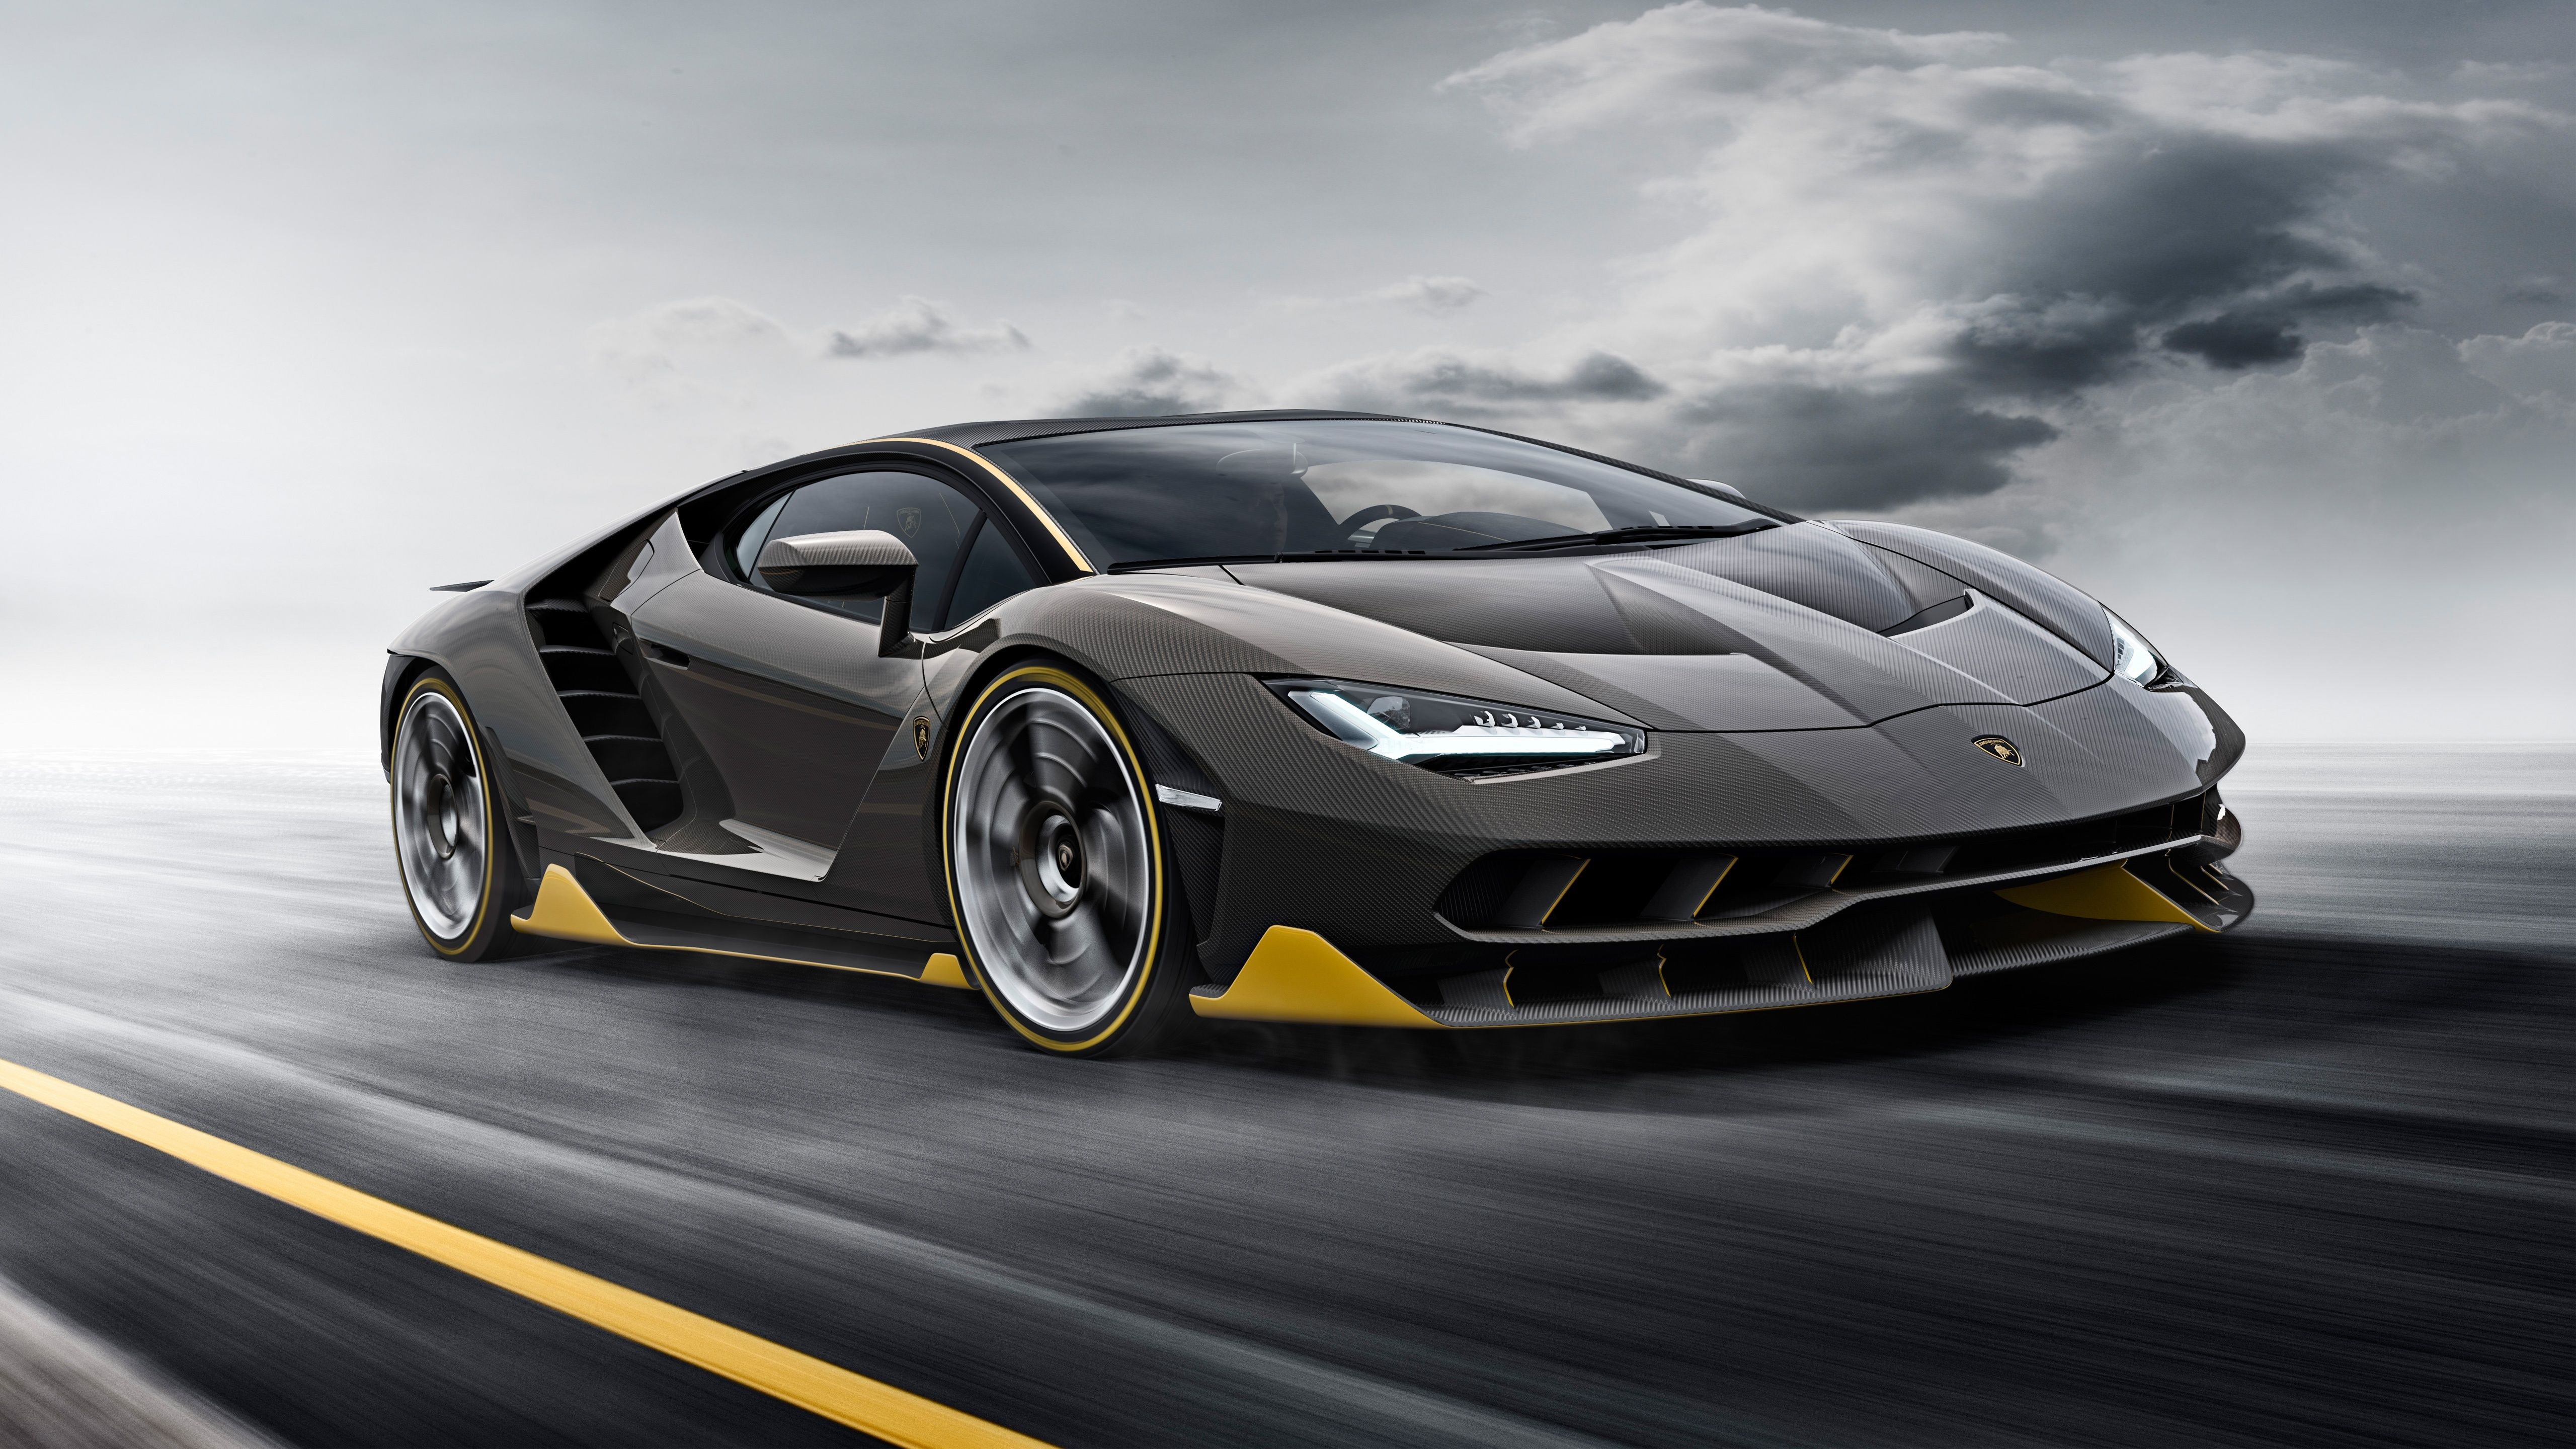 Картинка: Суперкар, Lamborghini, Centanario, 2016, дорога, скорость